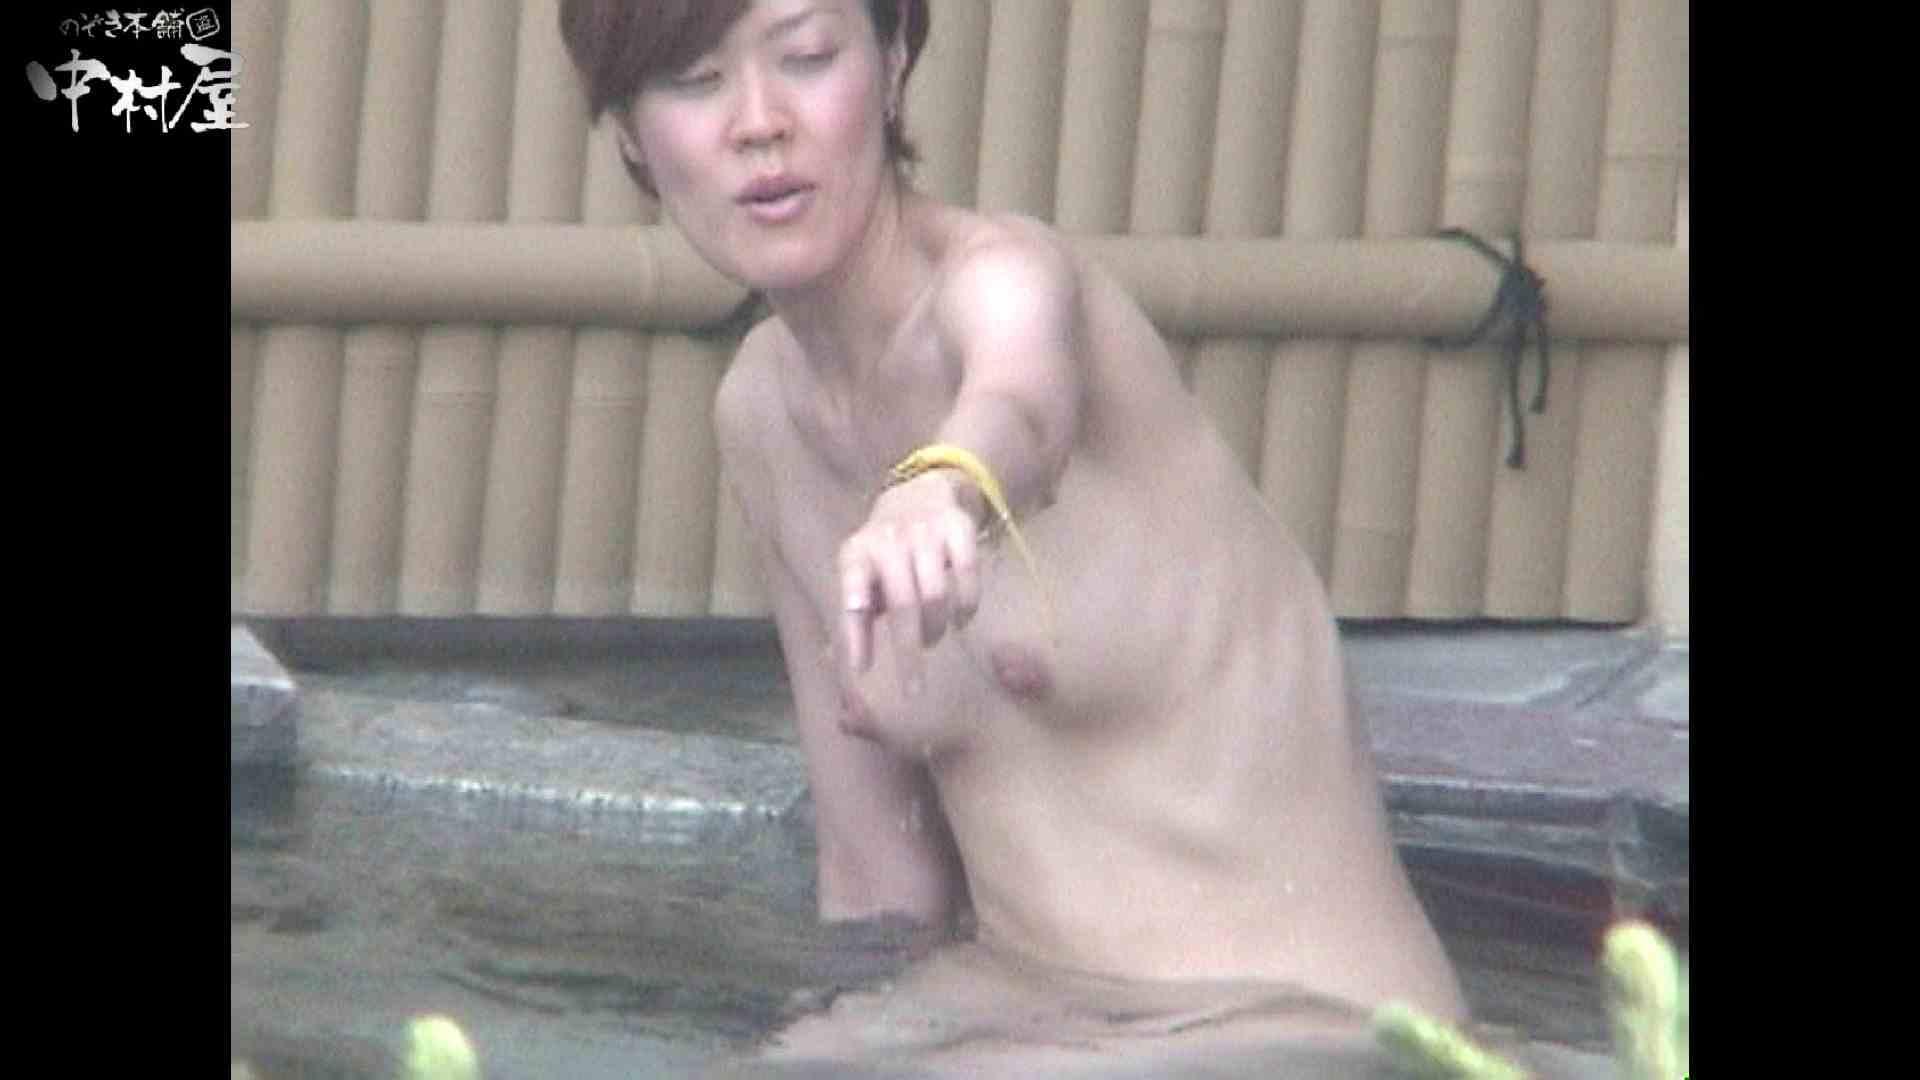 Aquaな露天風呂Vol.961 盗撮 のぞき動画画像 61枚 50